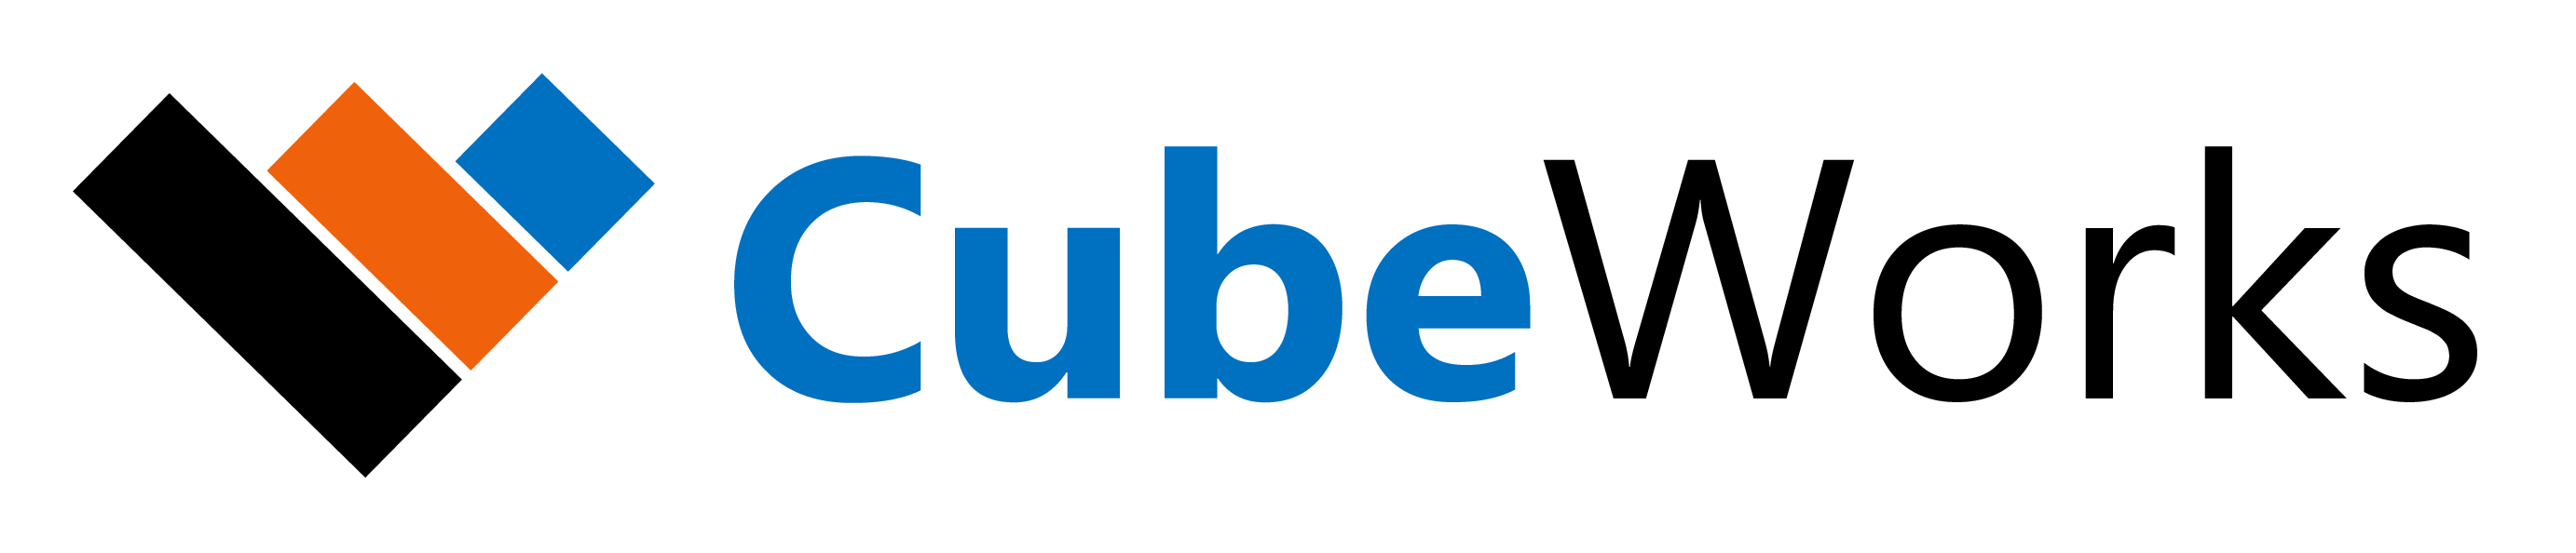 cubeworks logo